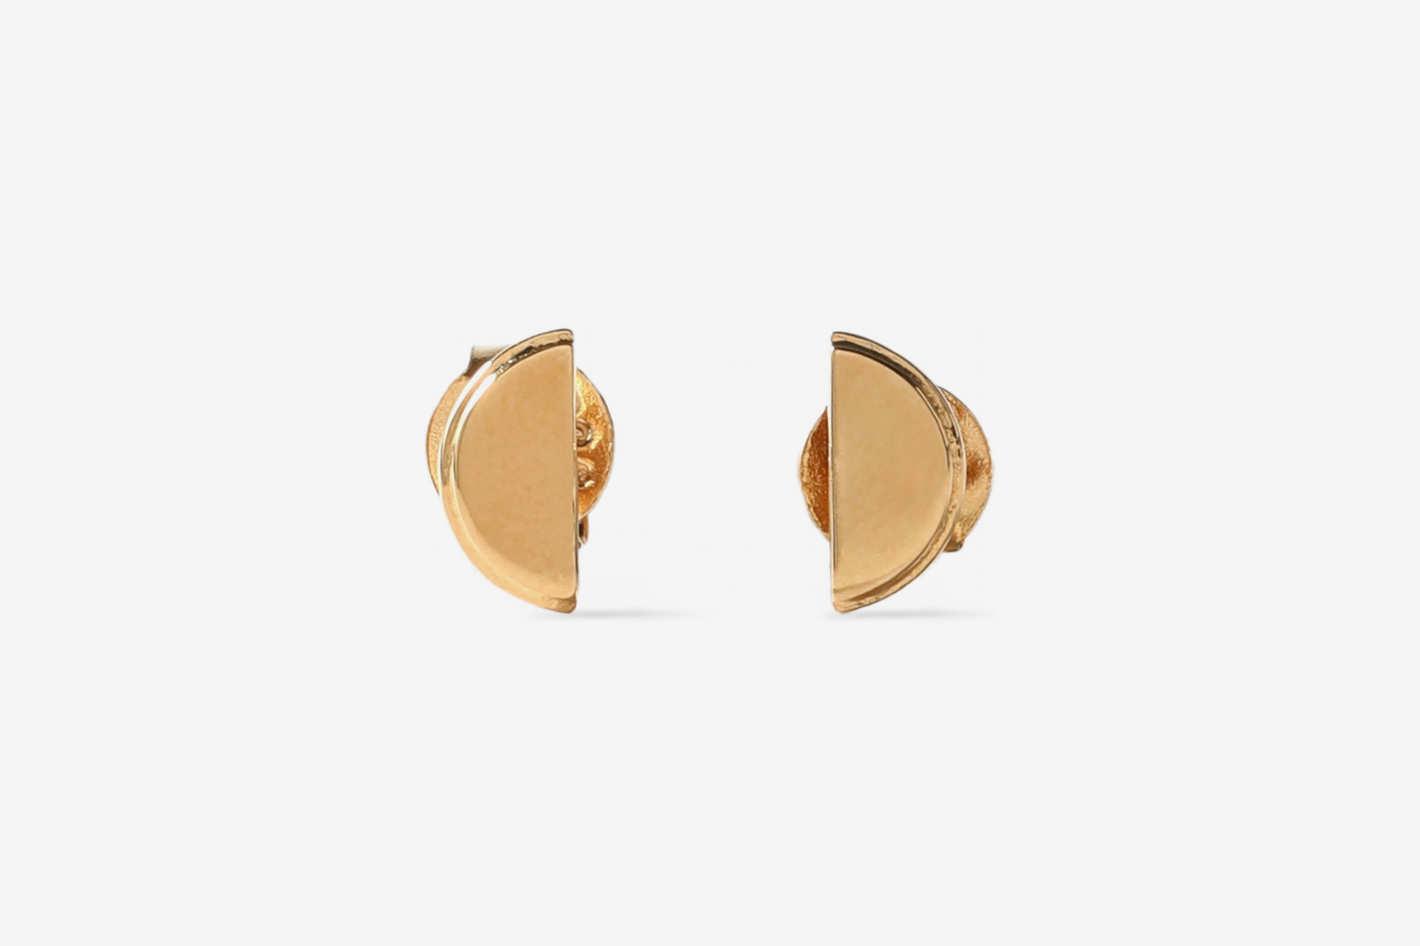 Rachel Jackson Gold-Tone Earrings